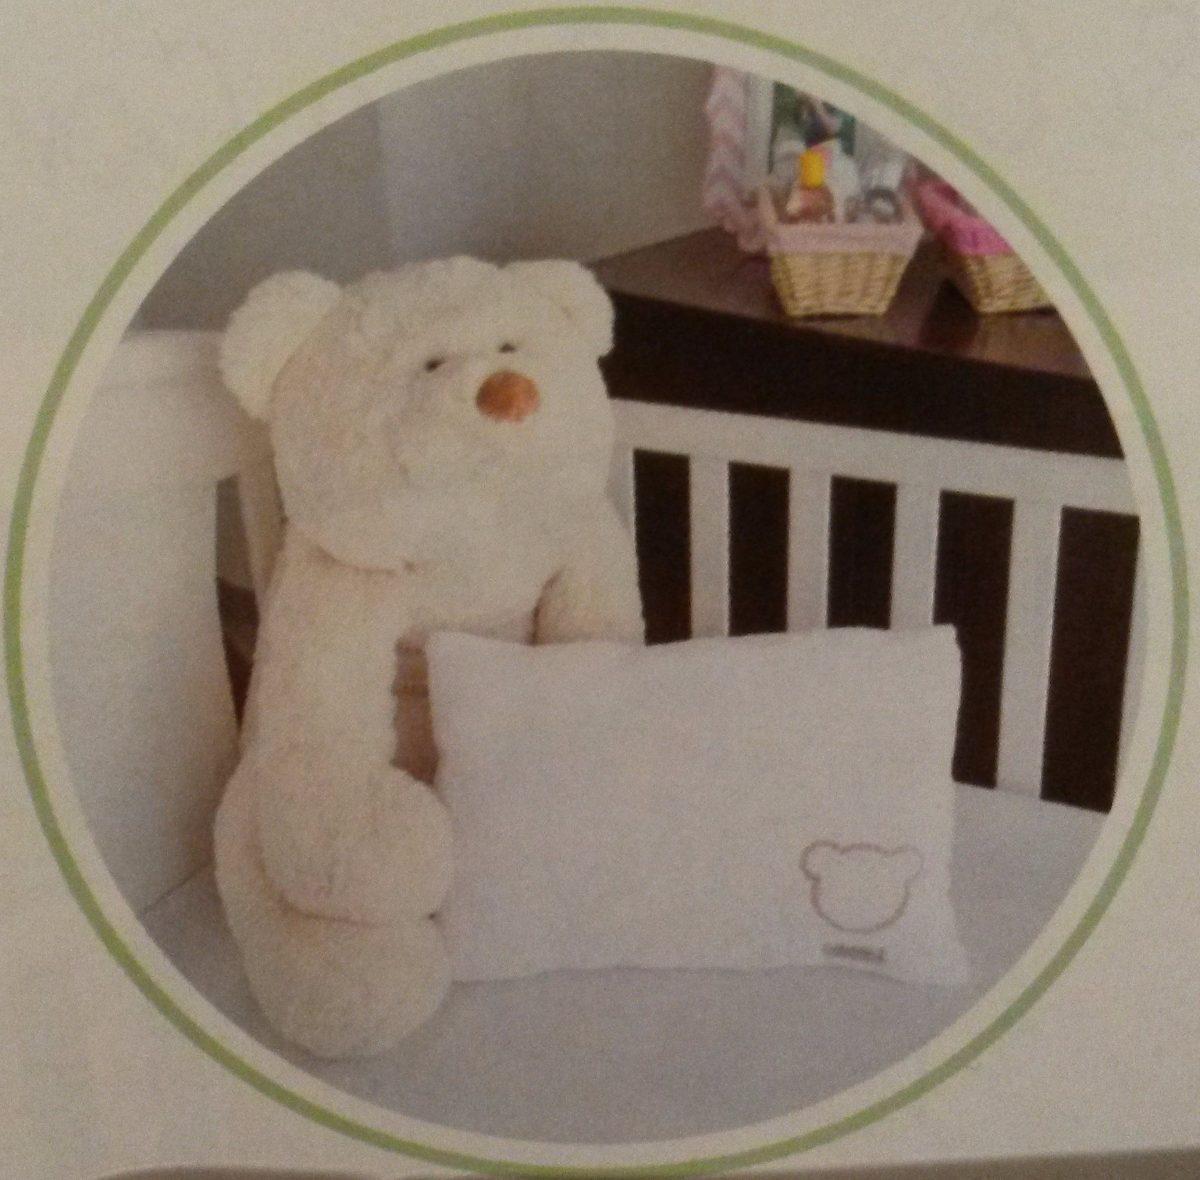 almohada almohadita para beb recien nacido cama cuna